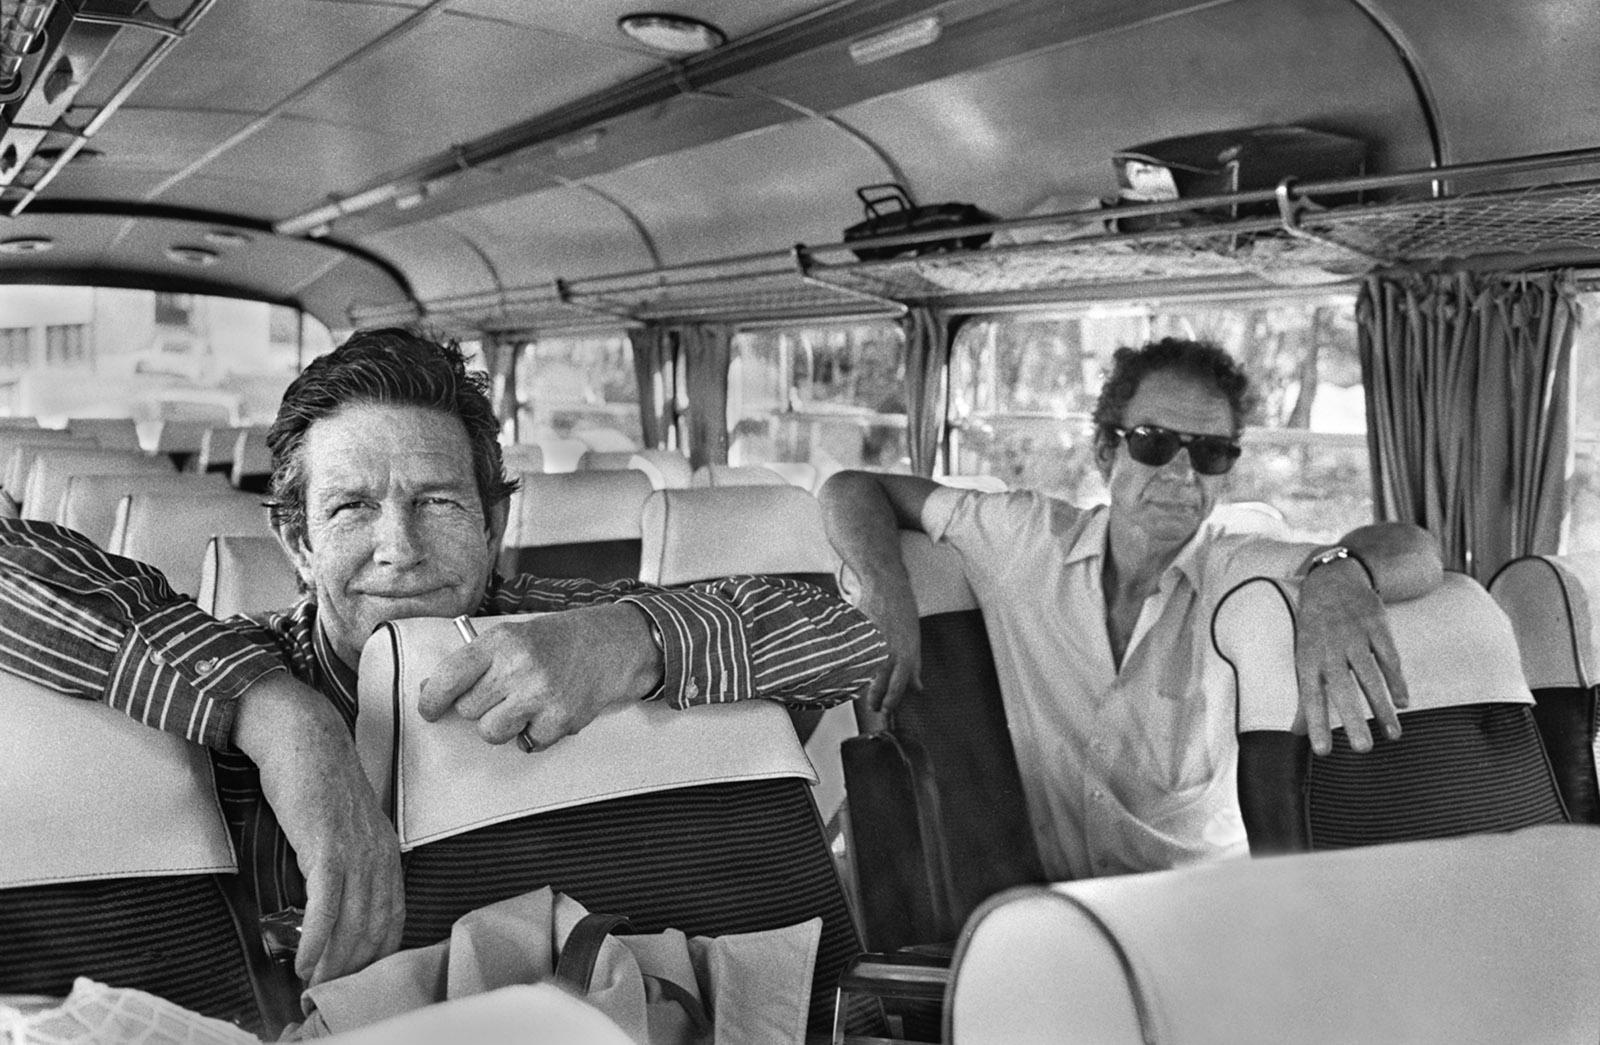 John Cage and Merce Cunningham, France, 1970